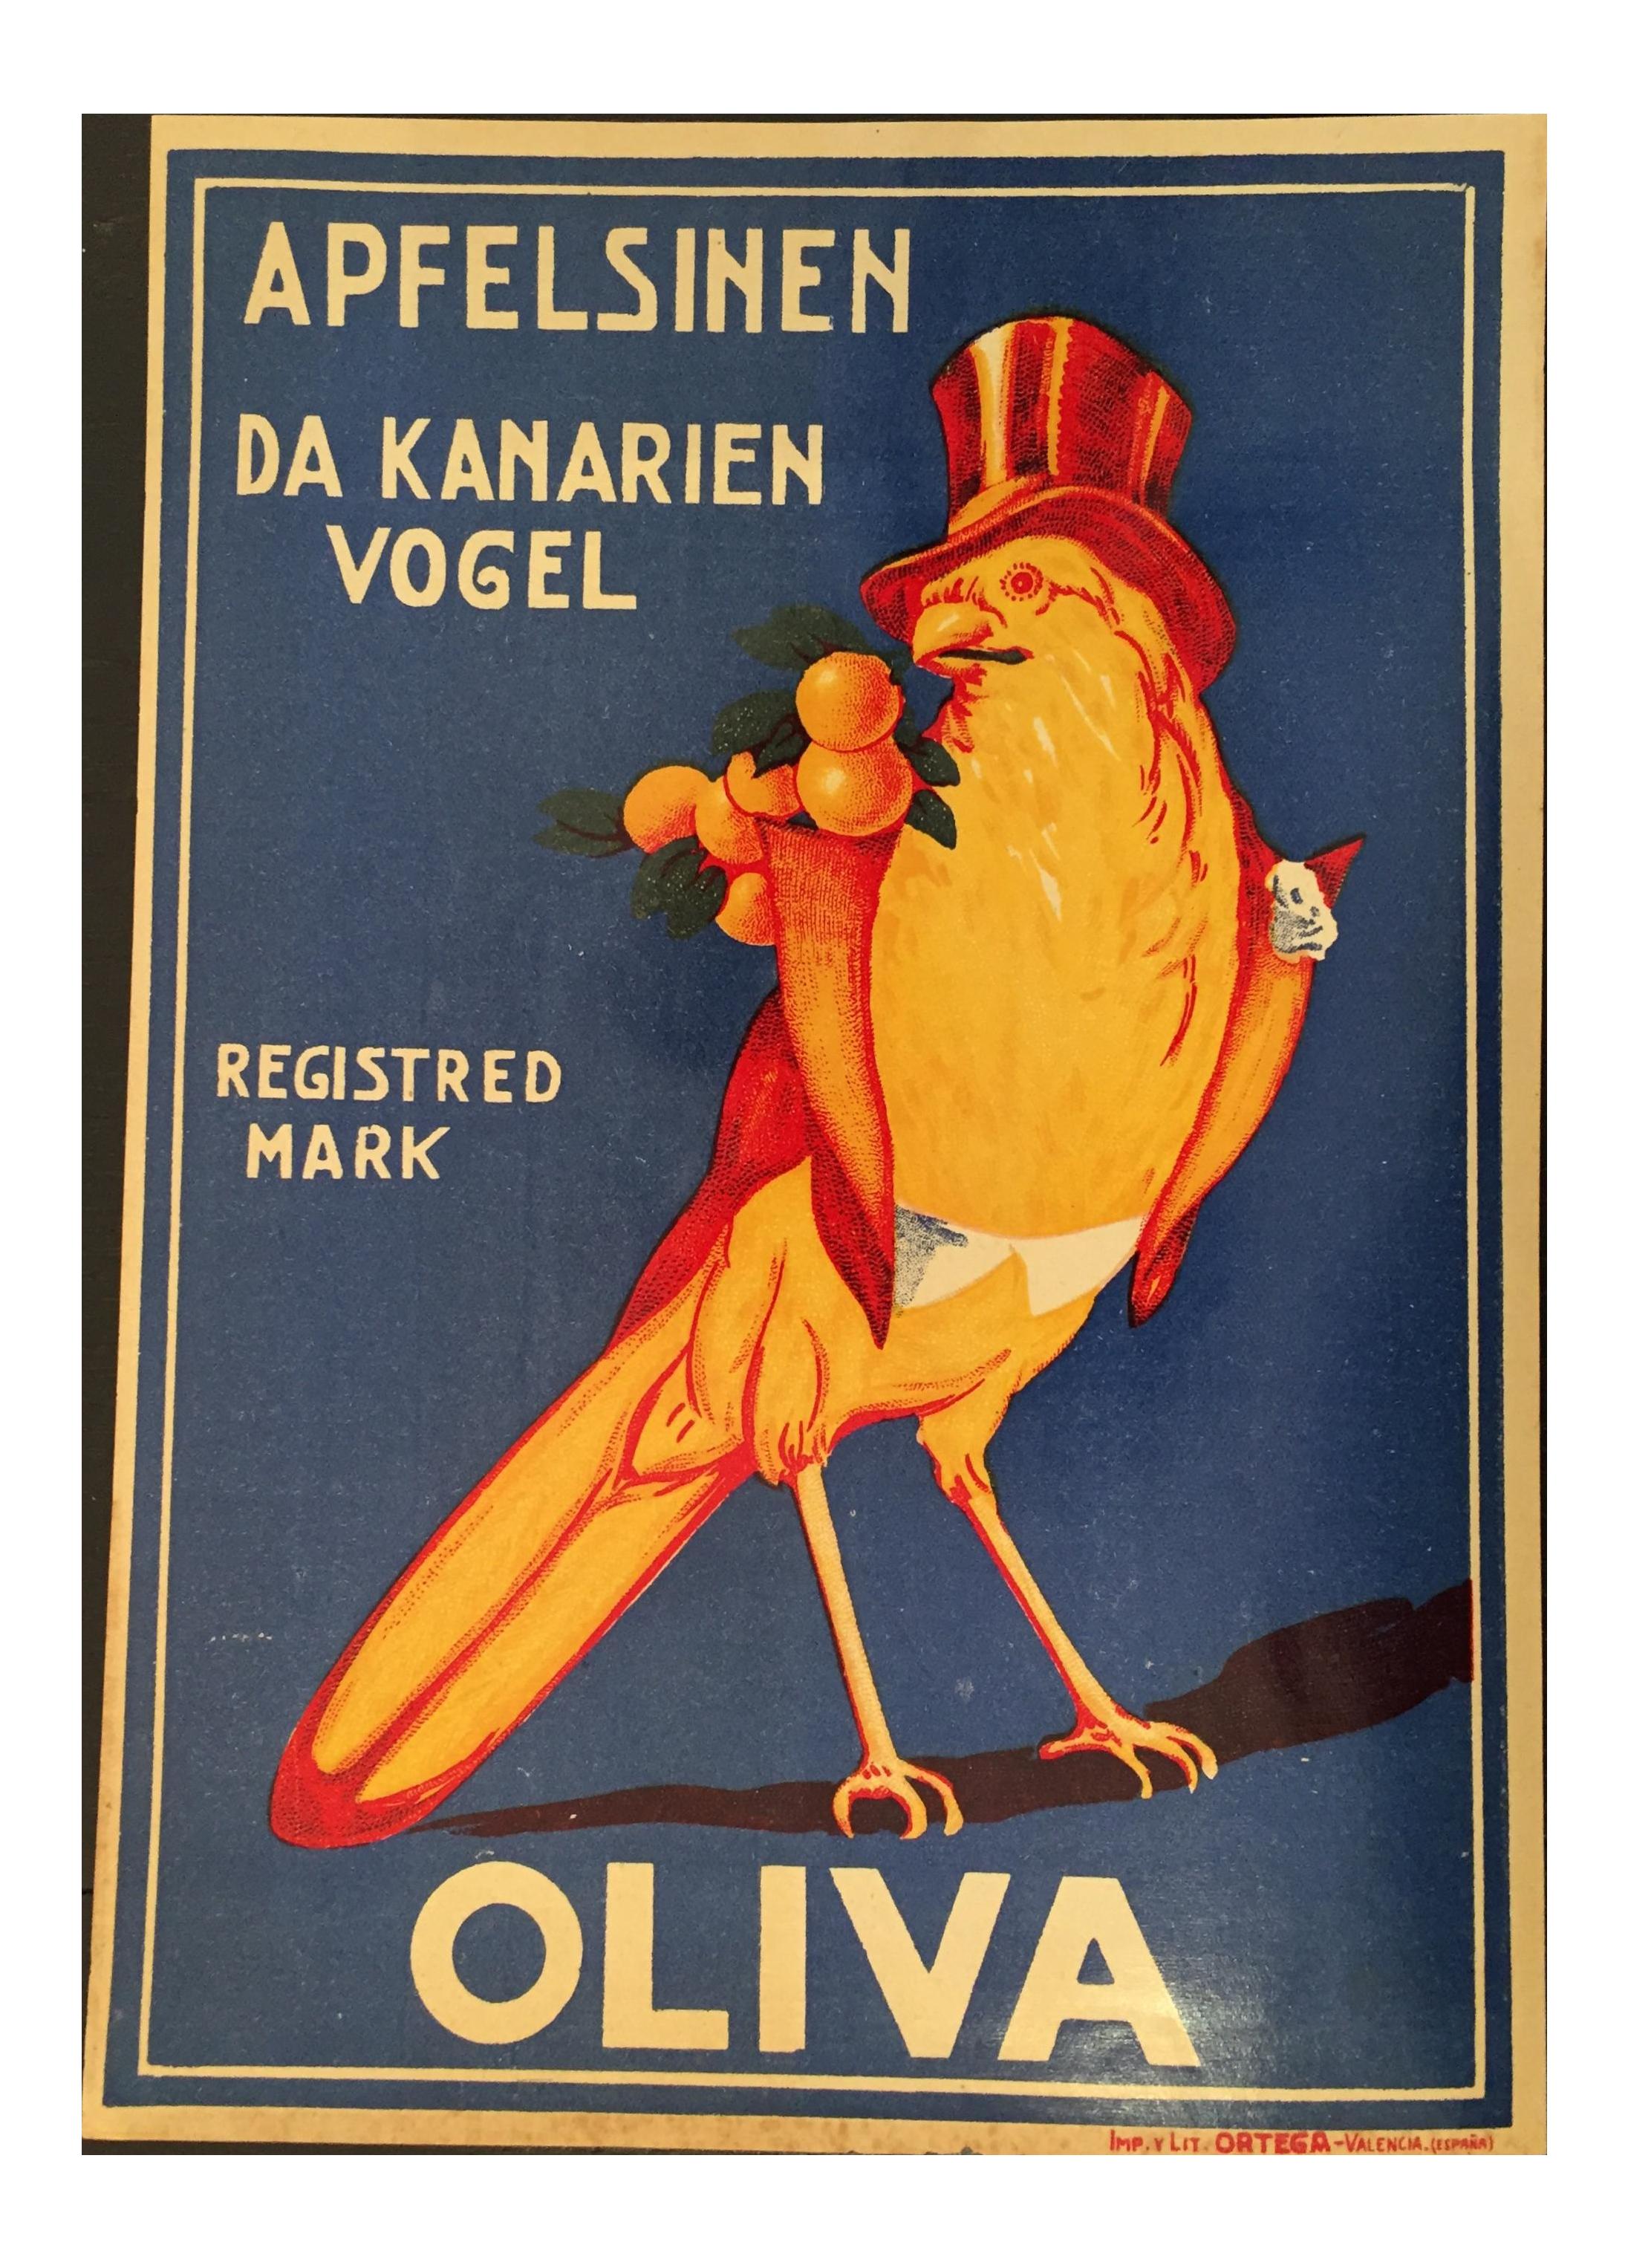 1920s Spanish Bungalow Plans: Vintage 1920s Spanish Art Deco Orange Crate Label